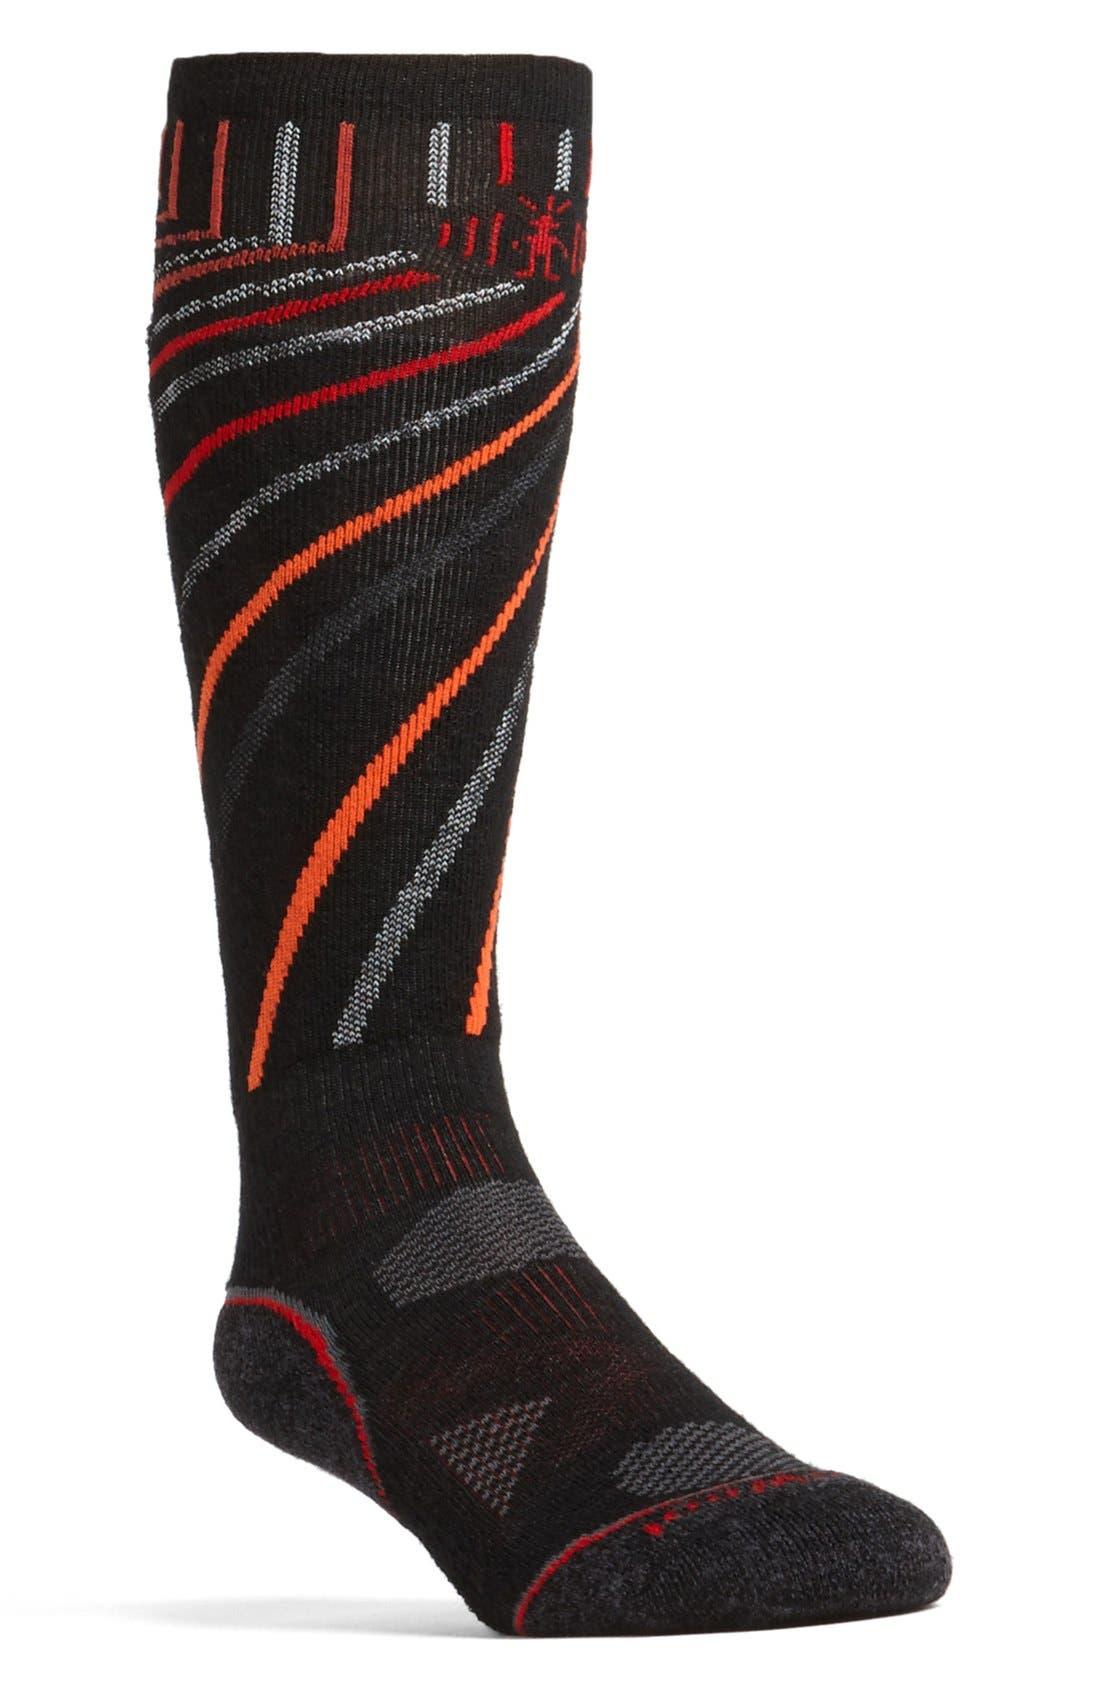 Main Image - Smartwool 'PhD - Light' Snowboard Socks